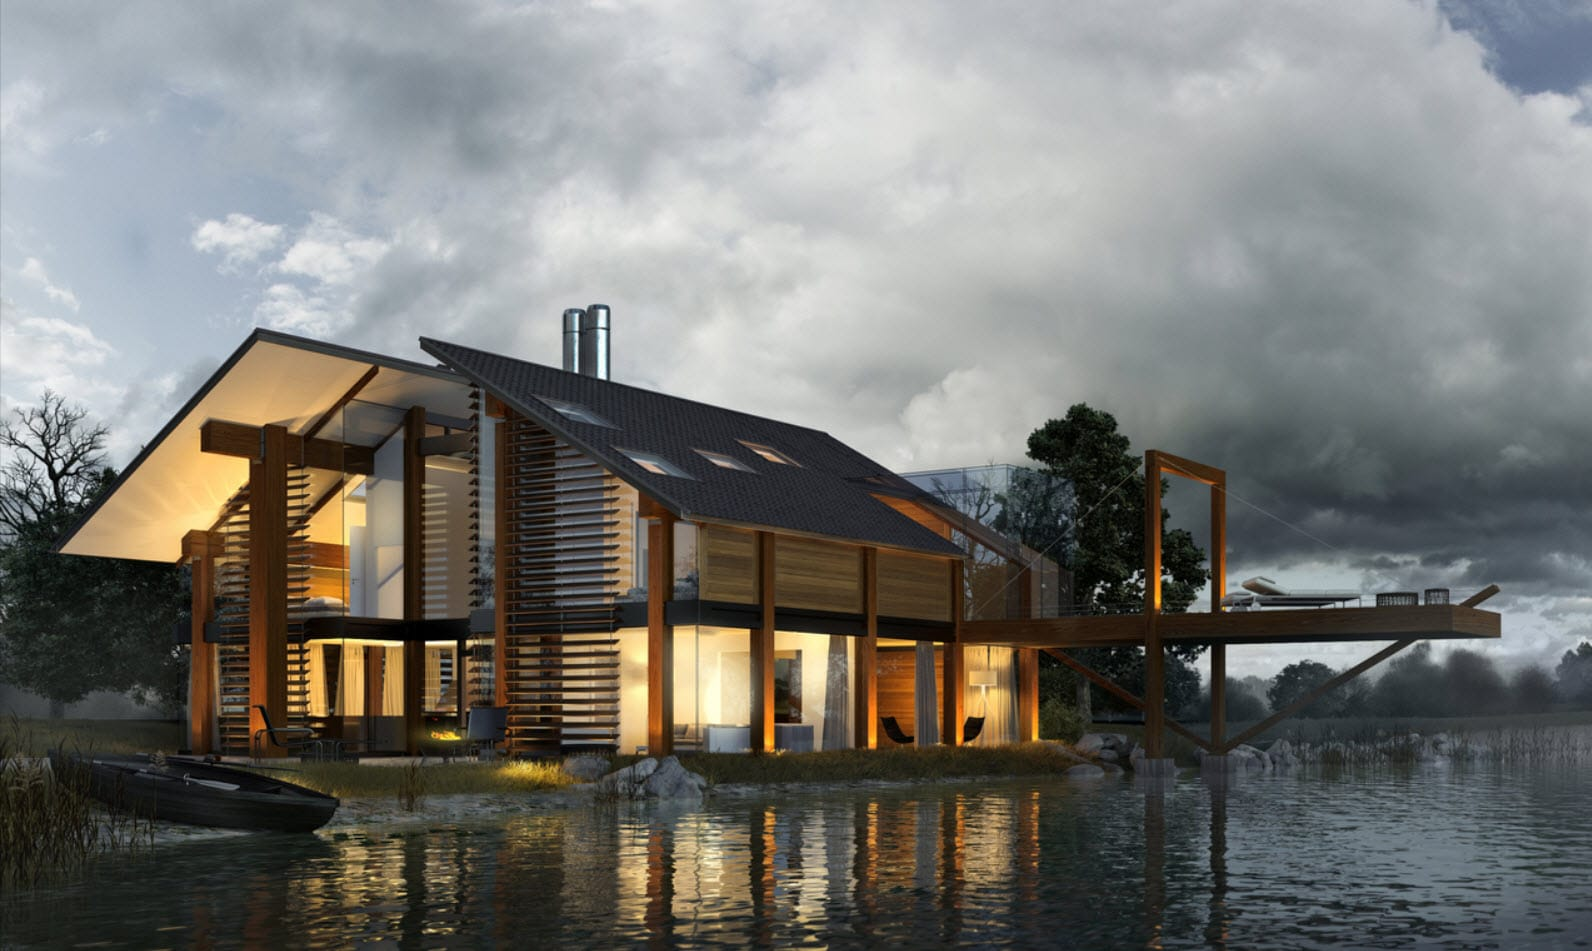 Dise o de casa de madera moderna hermosa fachada for Tejados de madera modernos